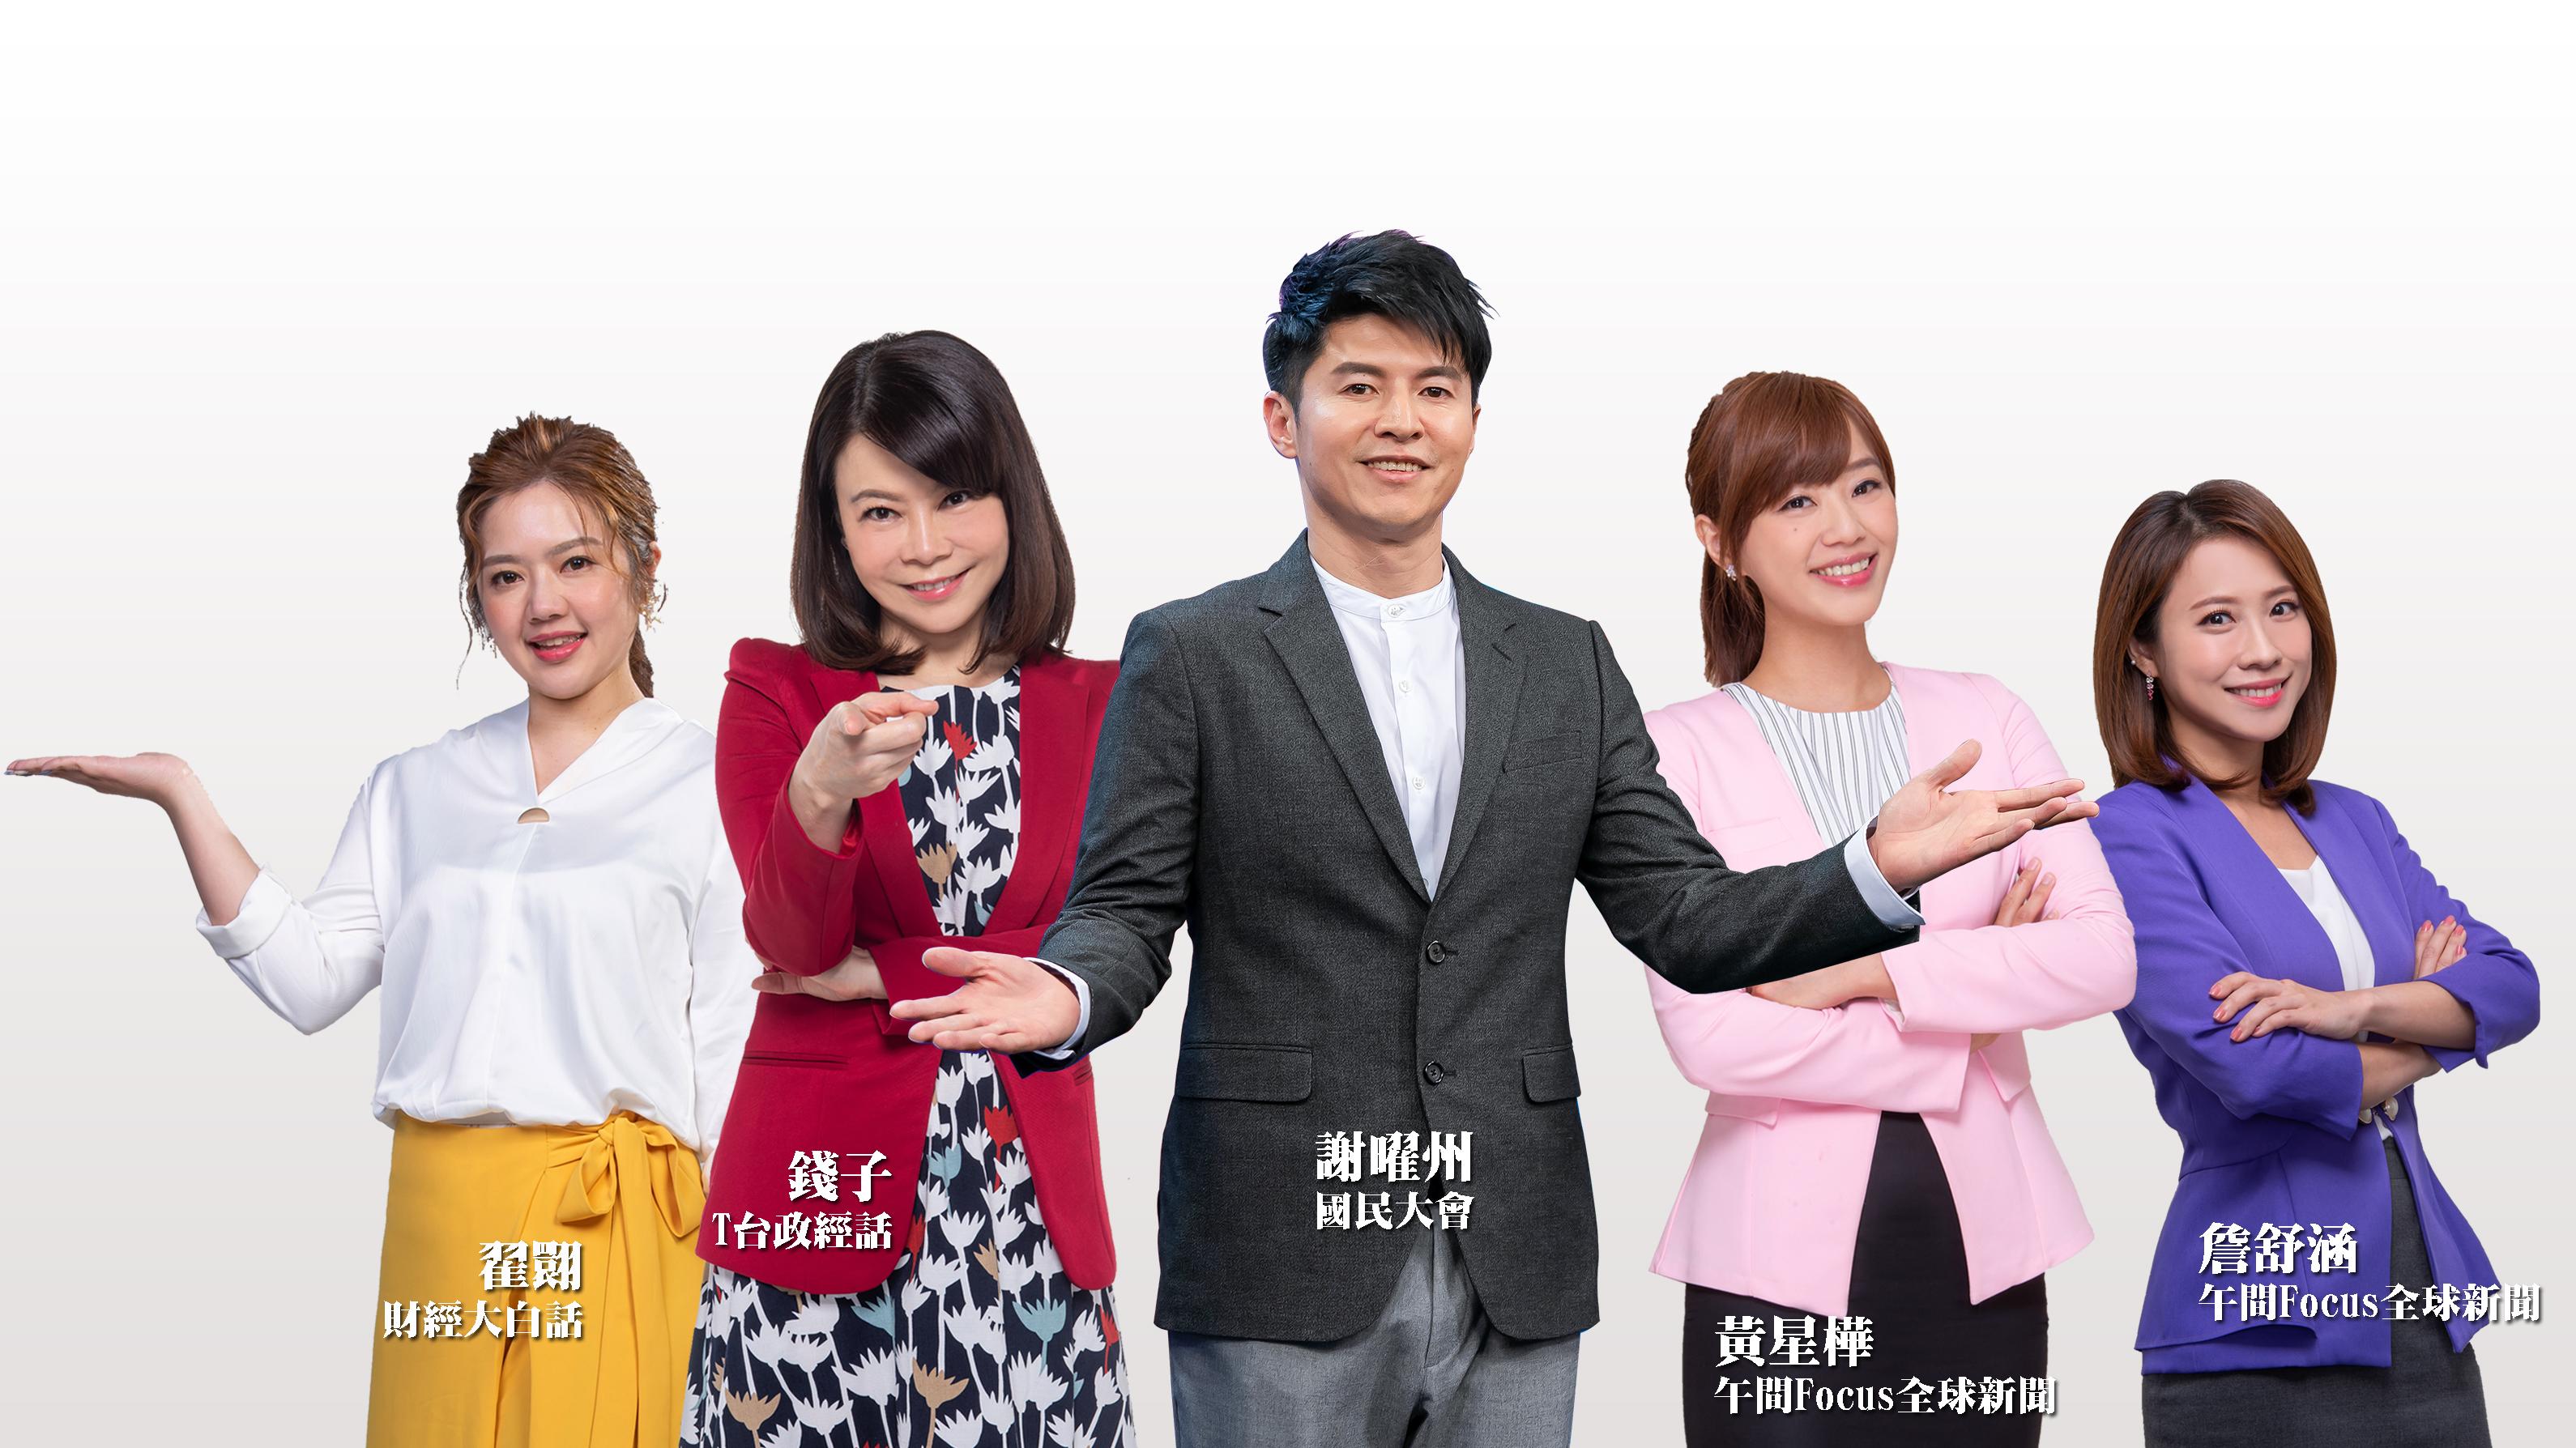 TVBS 56頻道全新改版 國際、財經與科技一把抓。圖/TVBS TVBS 56頻道全新改版 國際、財經與科技一把抓